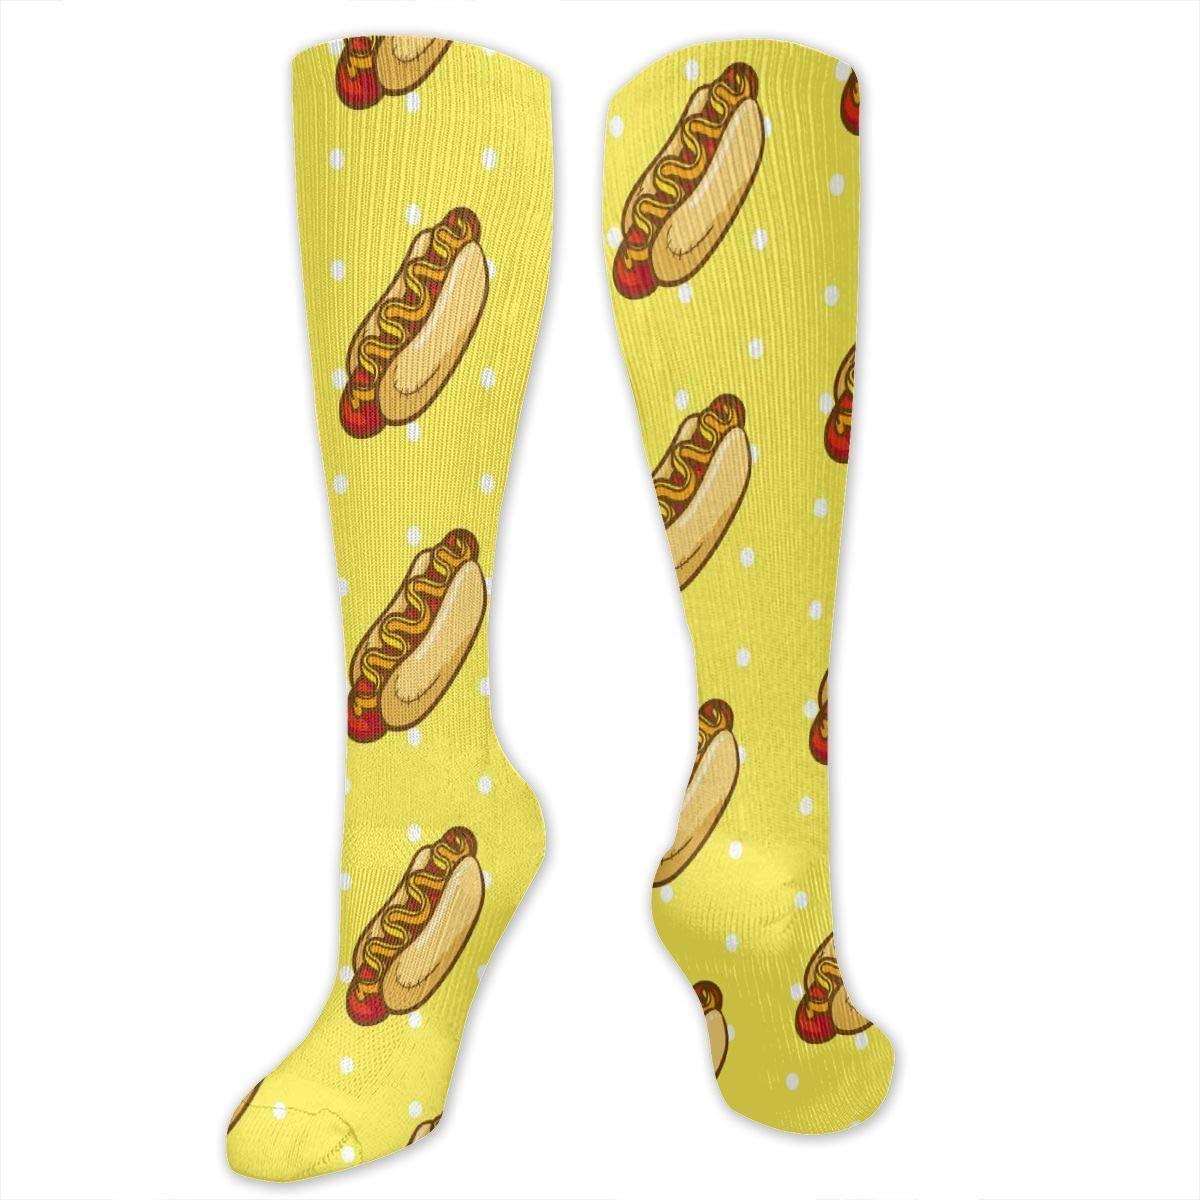 Hotdog Pattern Athletic Socks Thigh Stockings Over Knee Leg High Socks